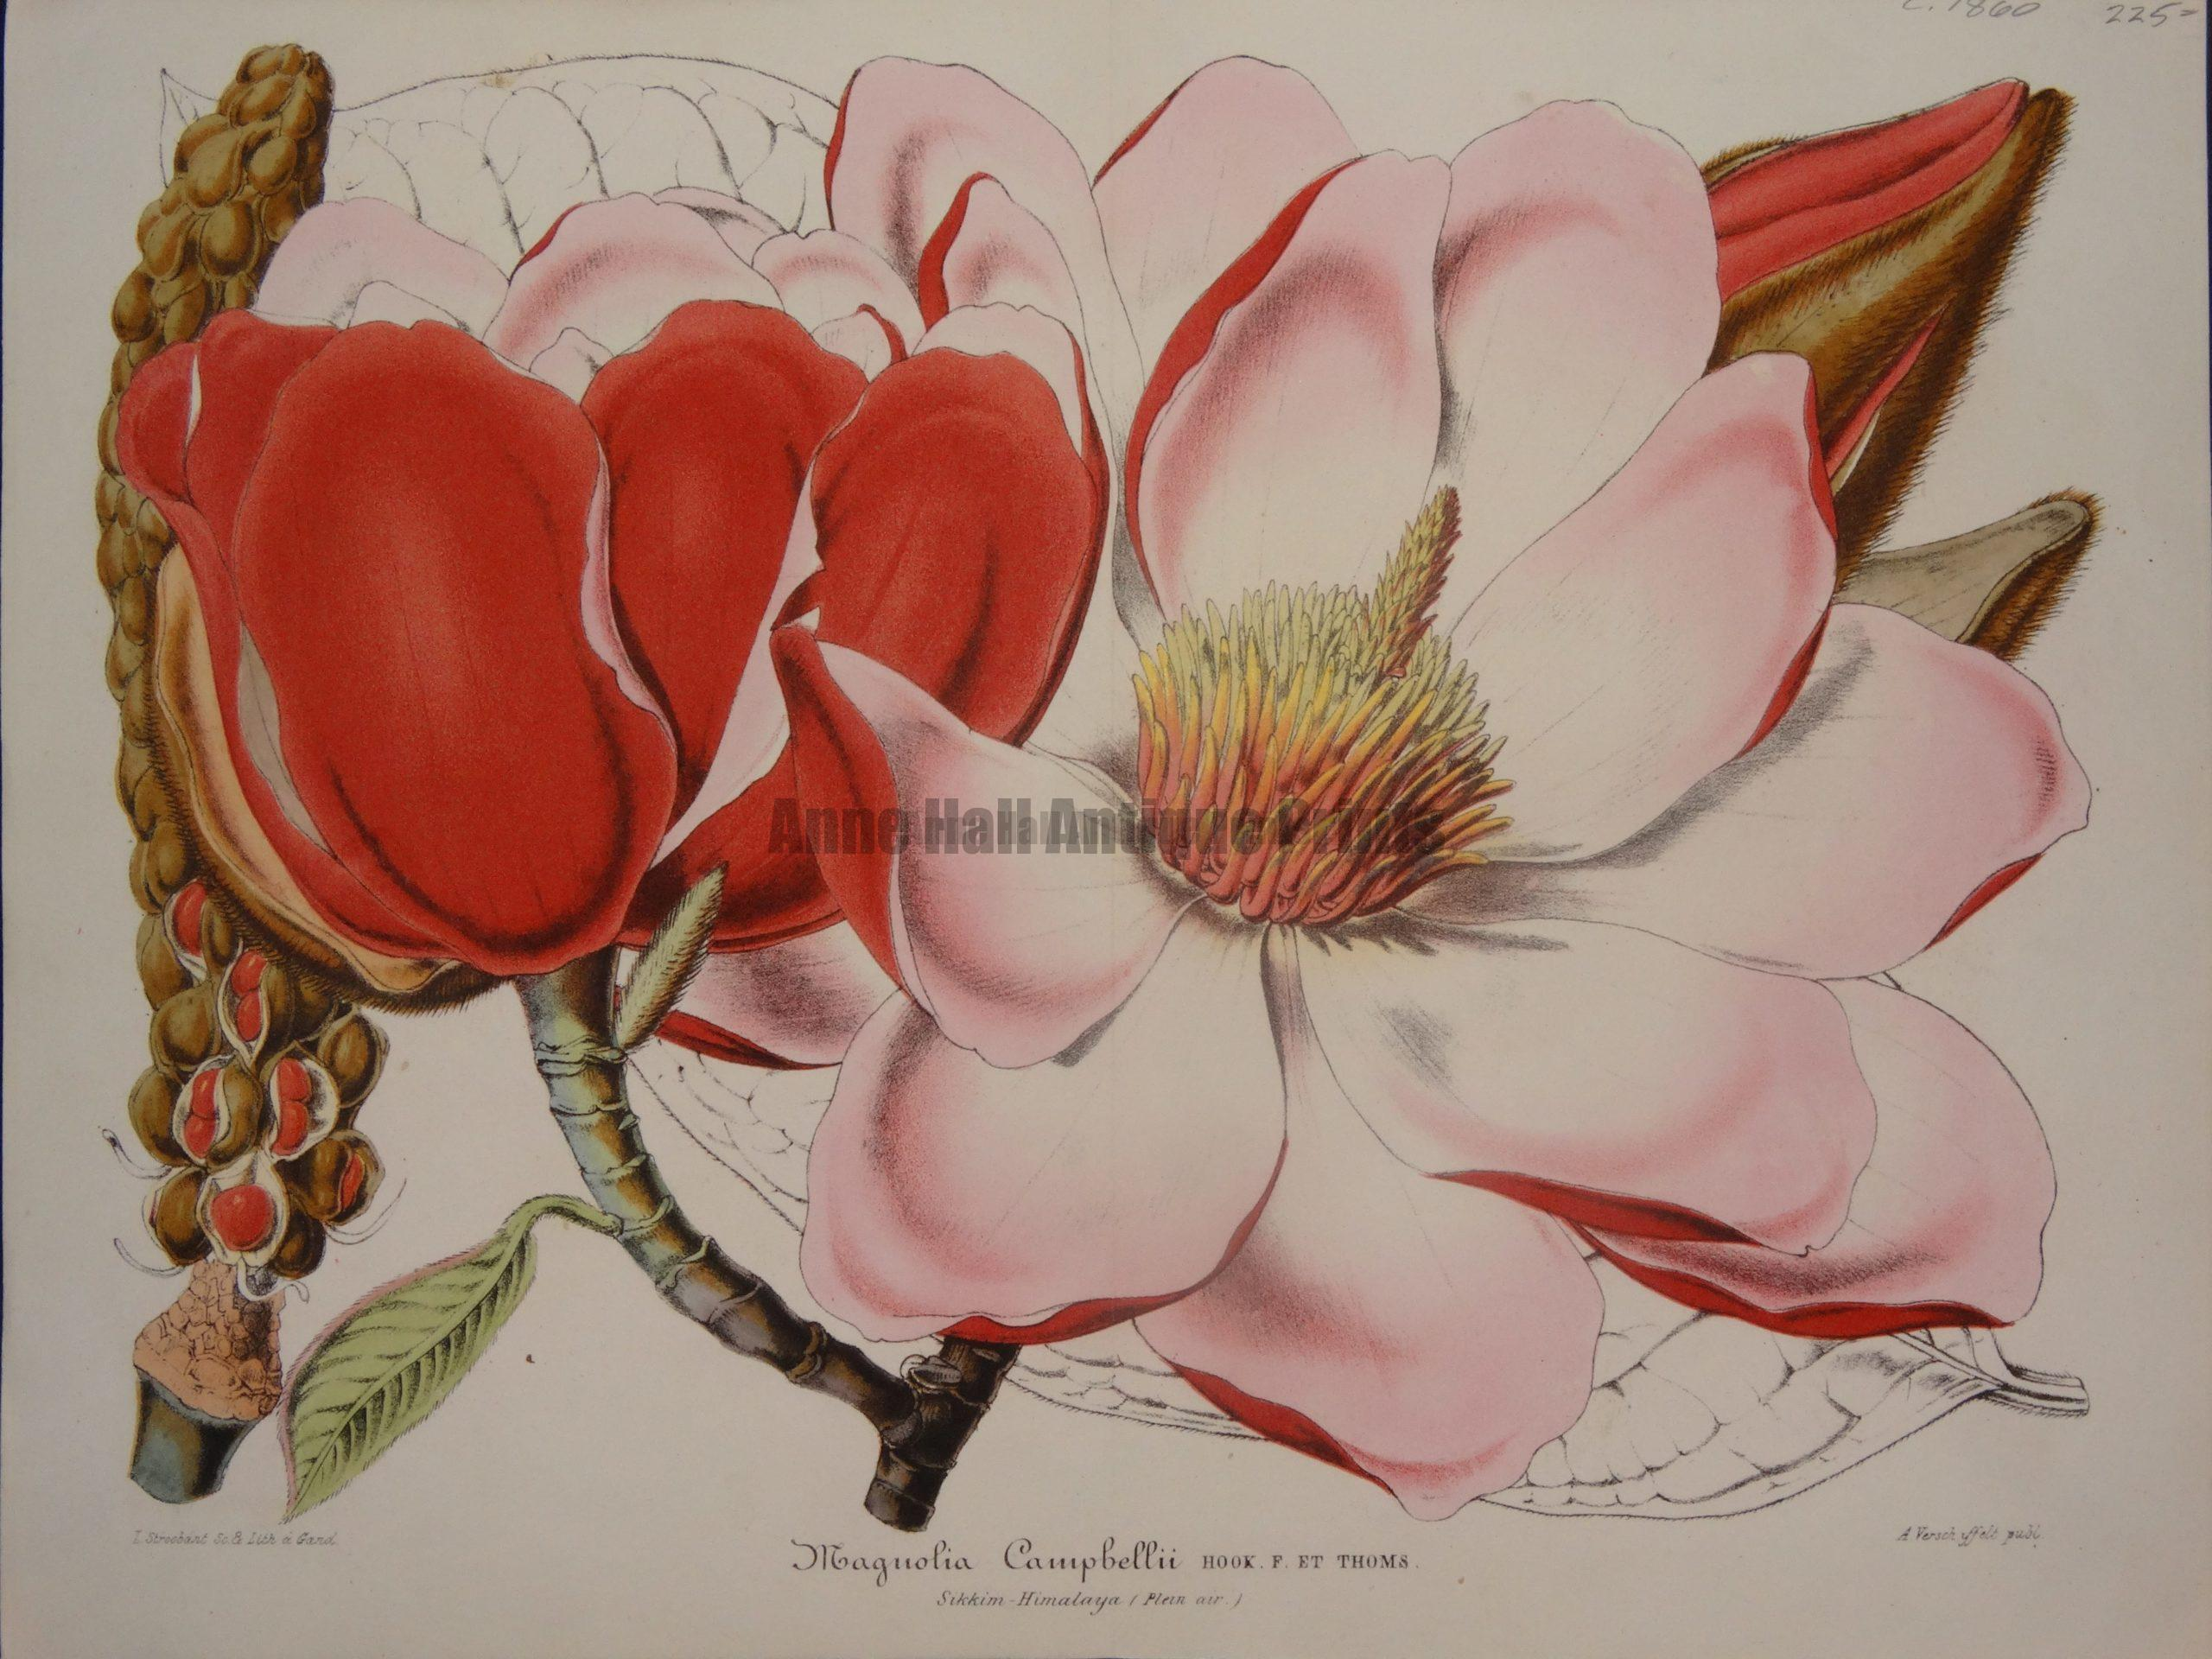 Magnolia Campbellii by Verschaffelt, $225.